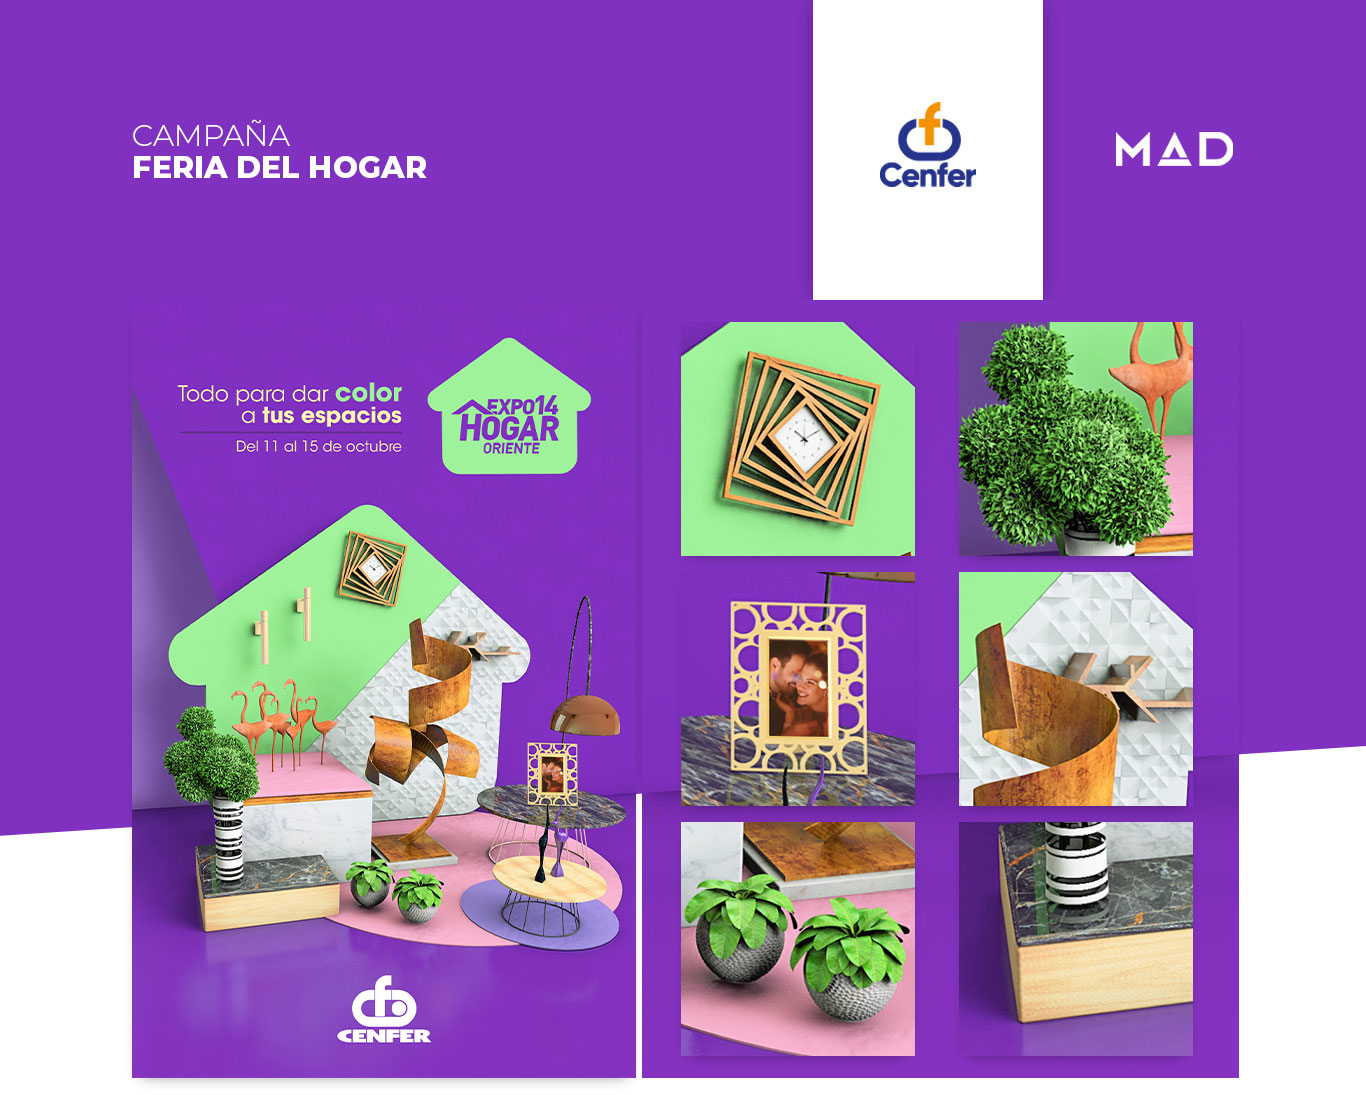 Mockup-Retoque-Feria-del-Hogar-Cenfer-01